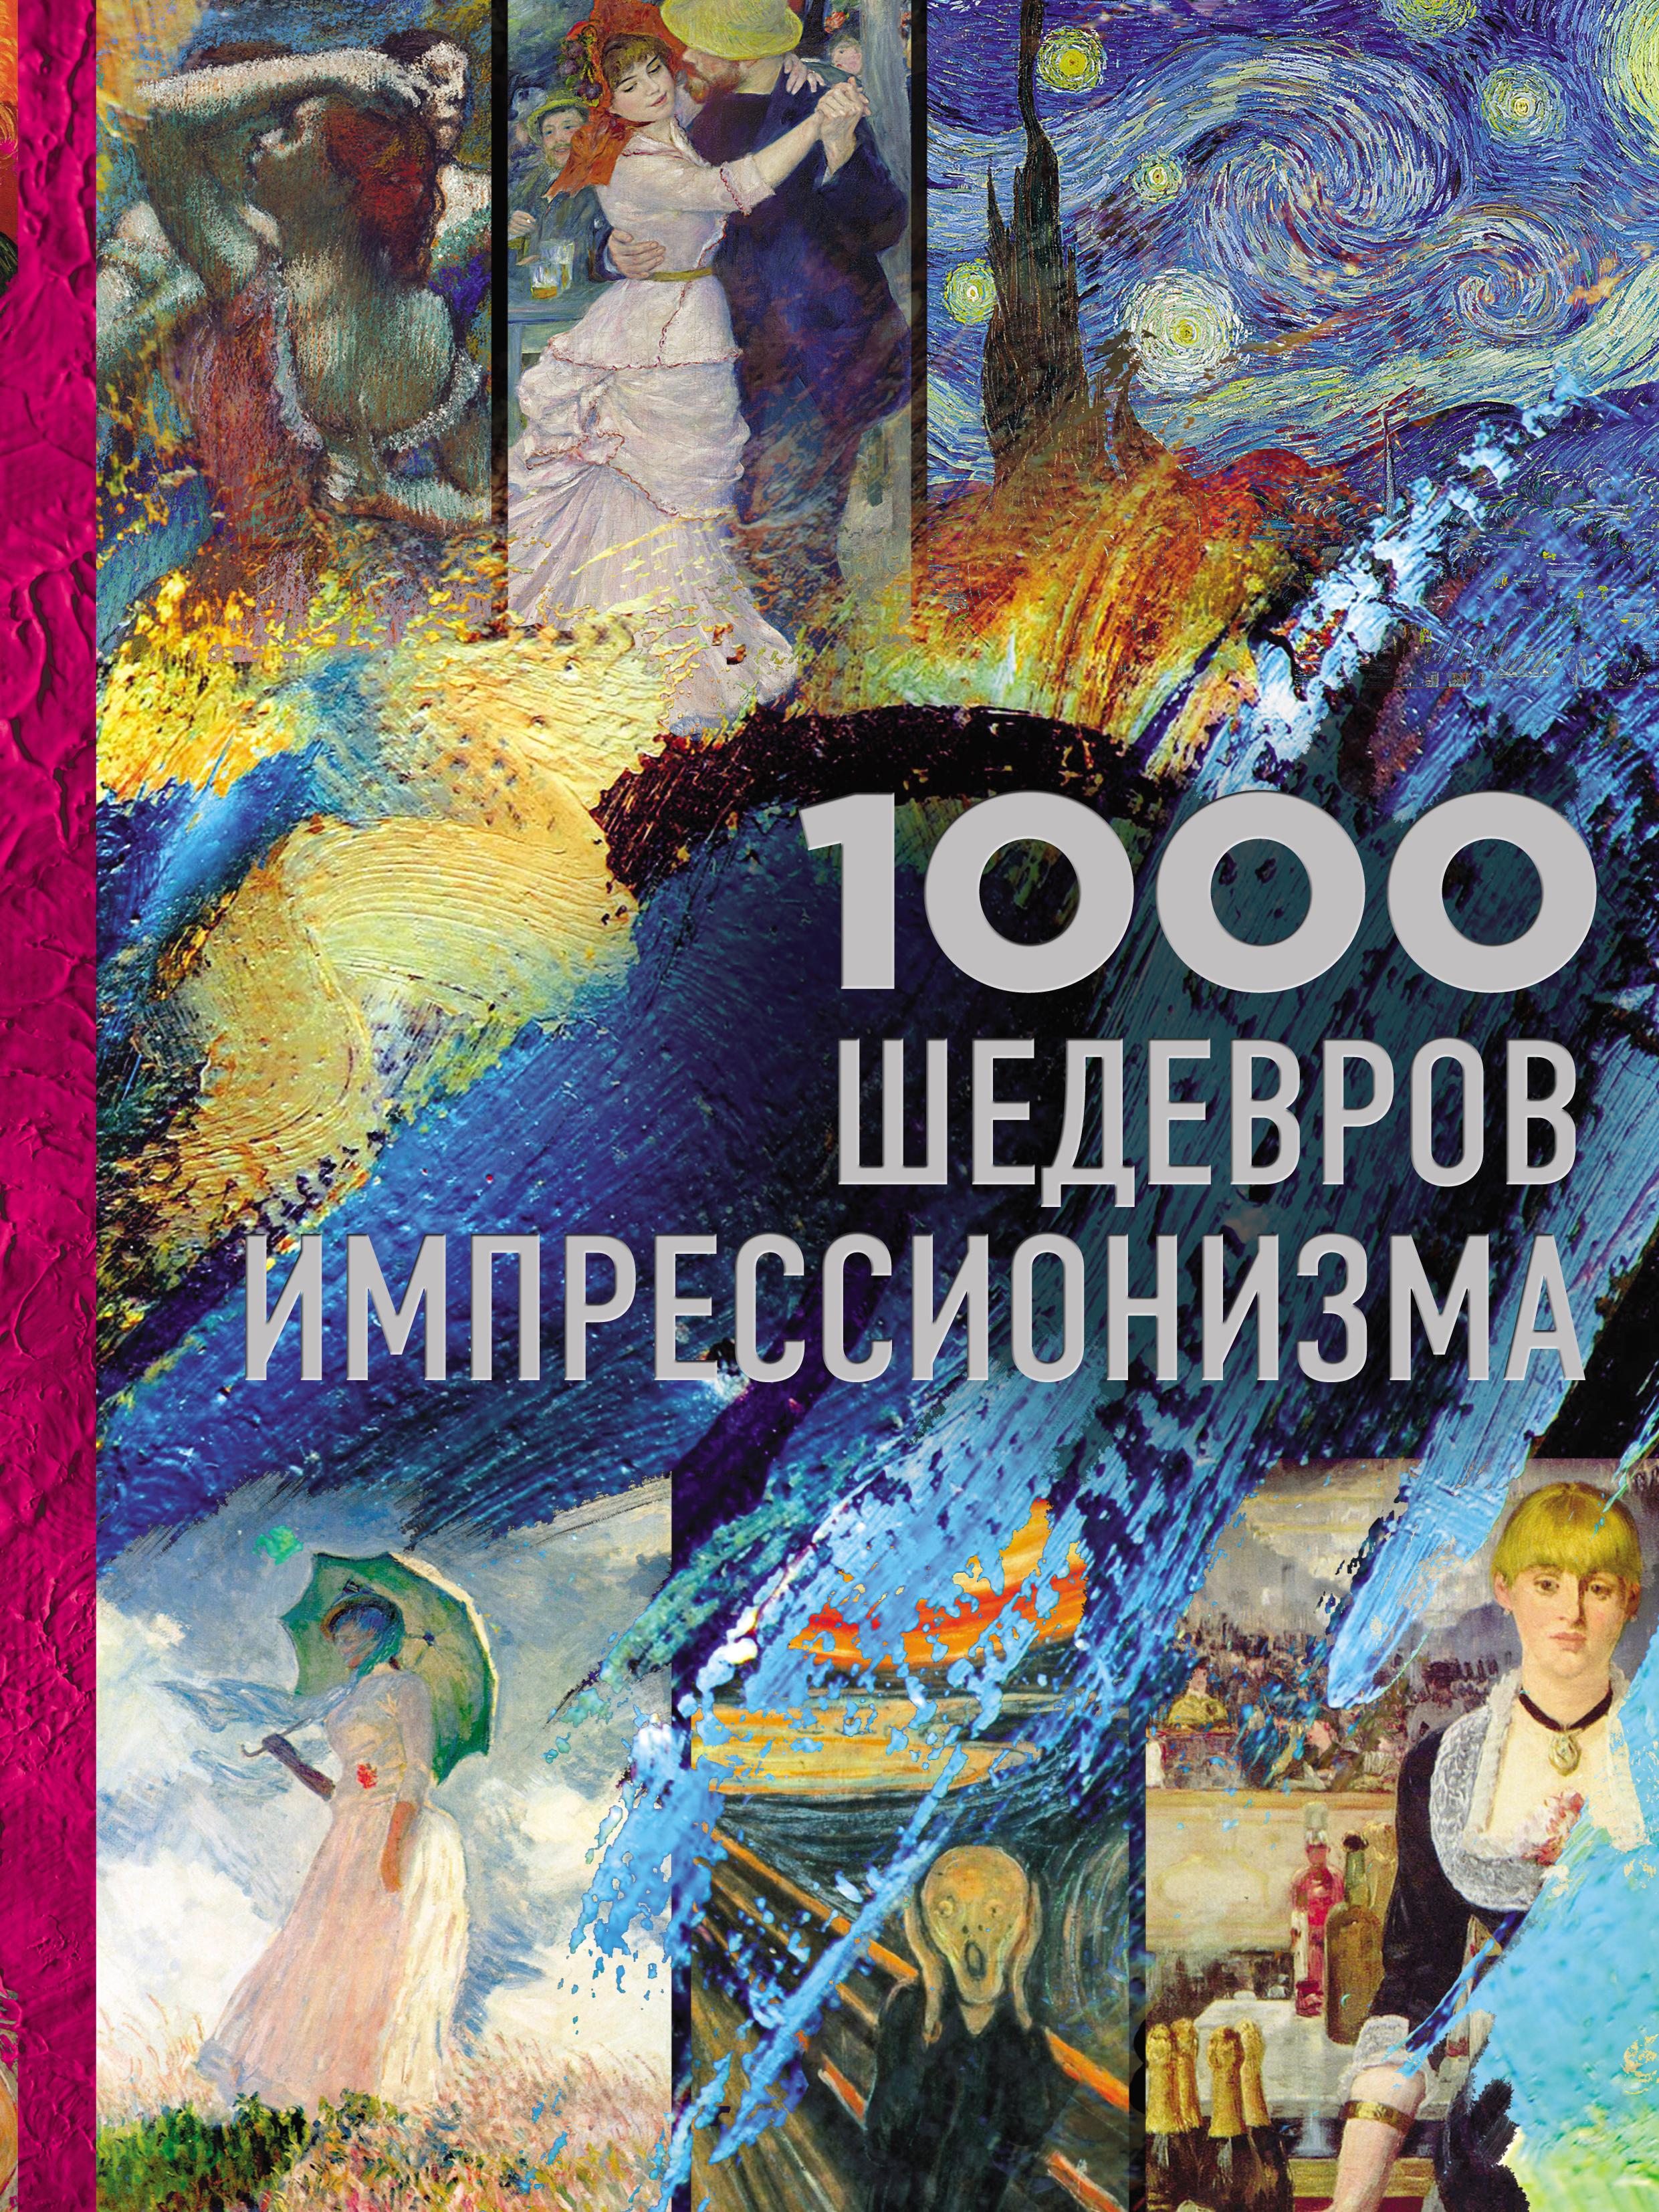 1000 shedevrov impressionizma